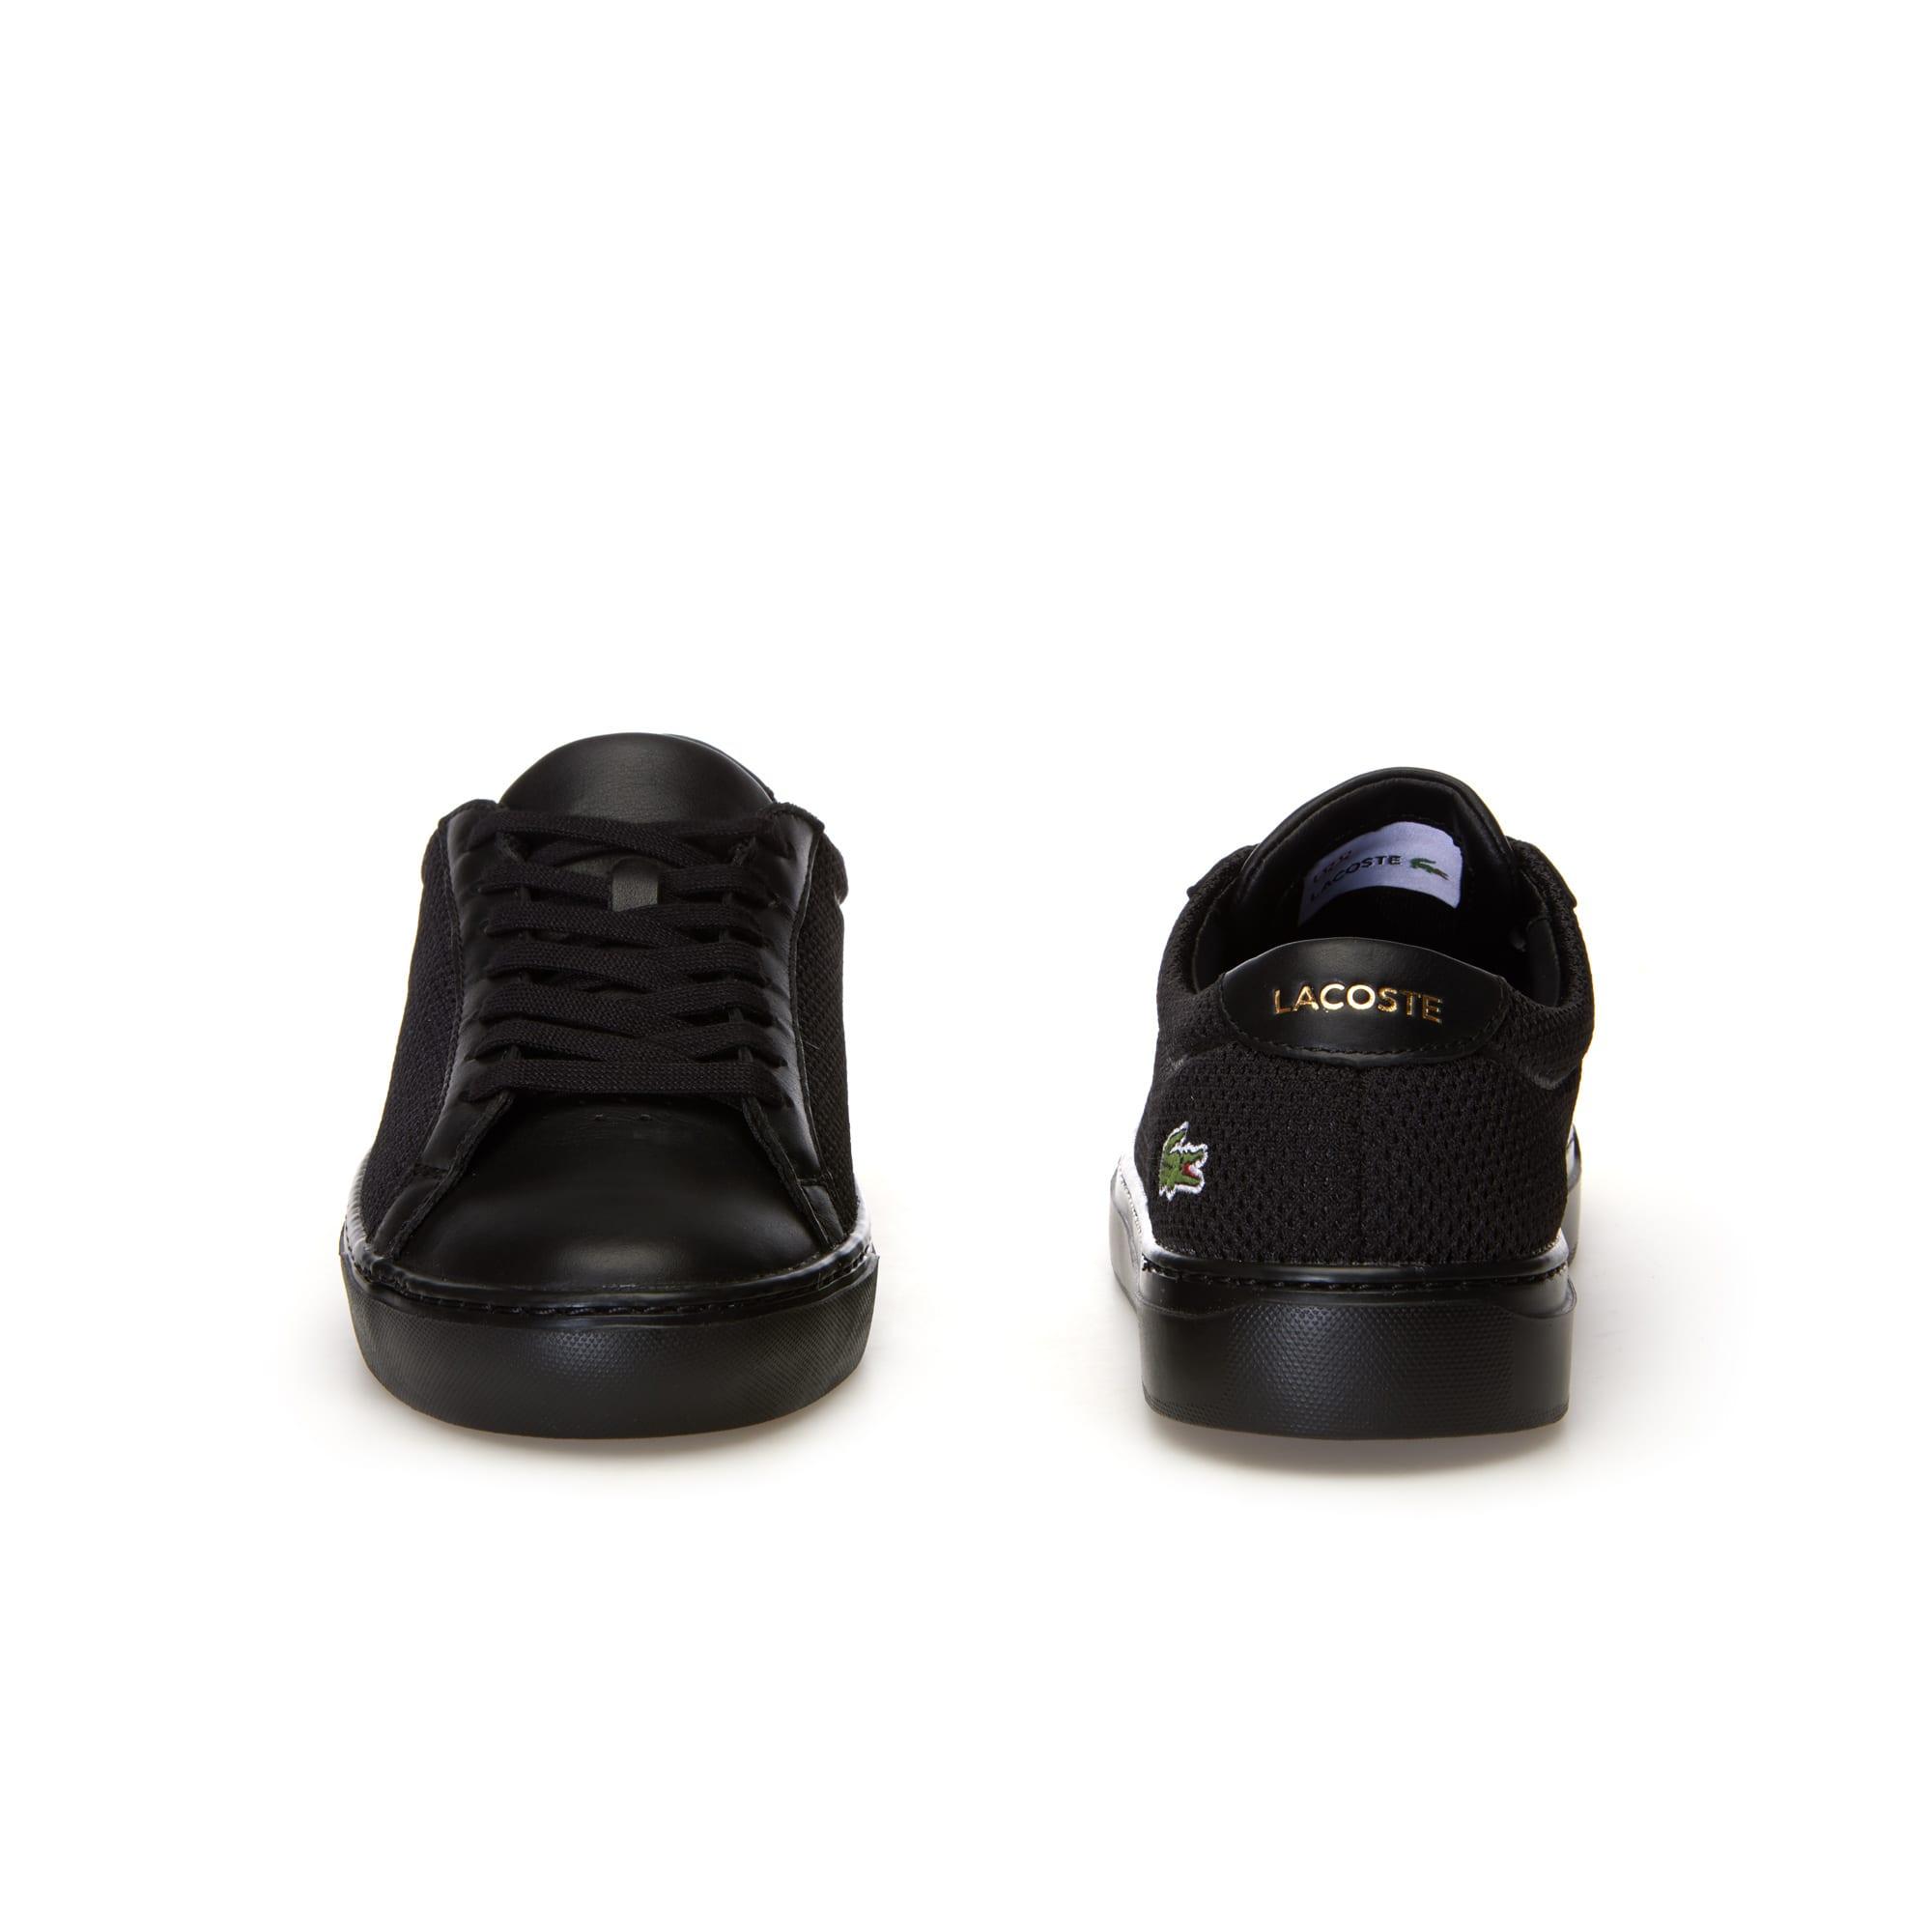 fd7eee6c92 Zapatillas de hombre L.12.12 LIGHT-WT de piel y material textil ...